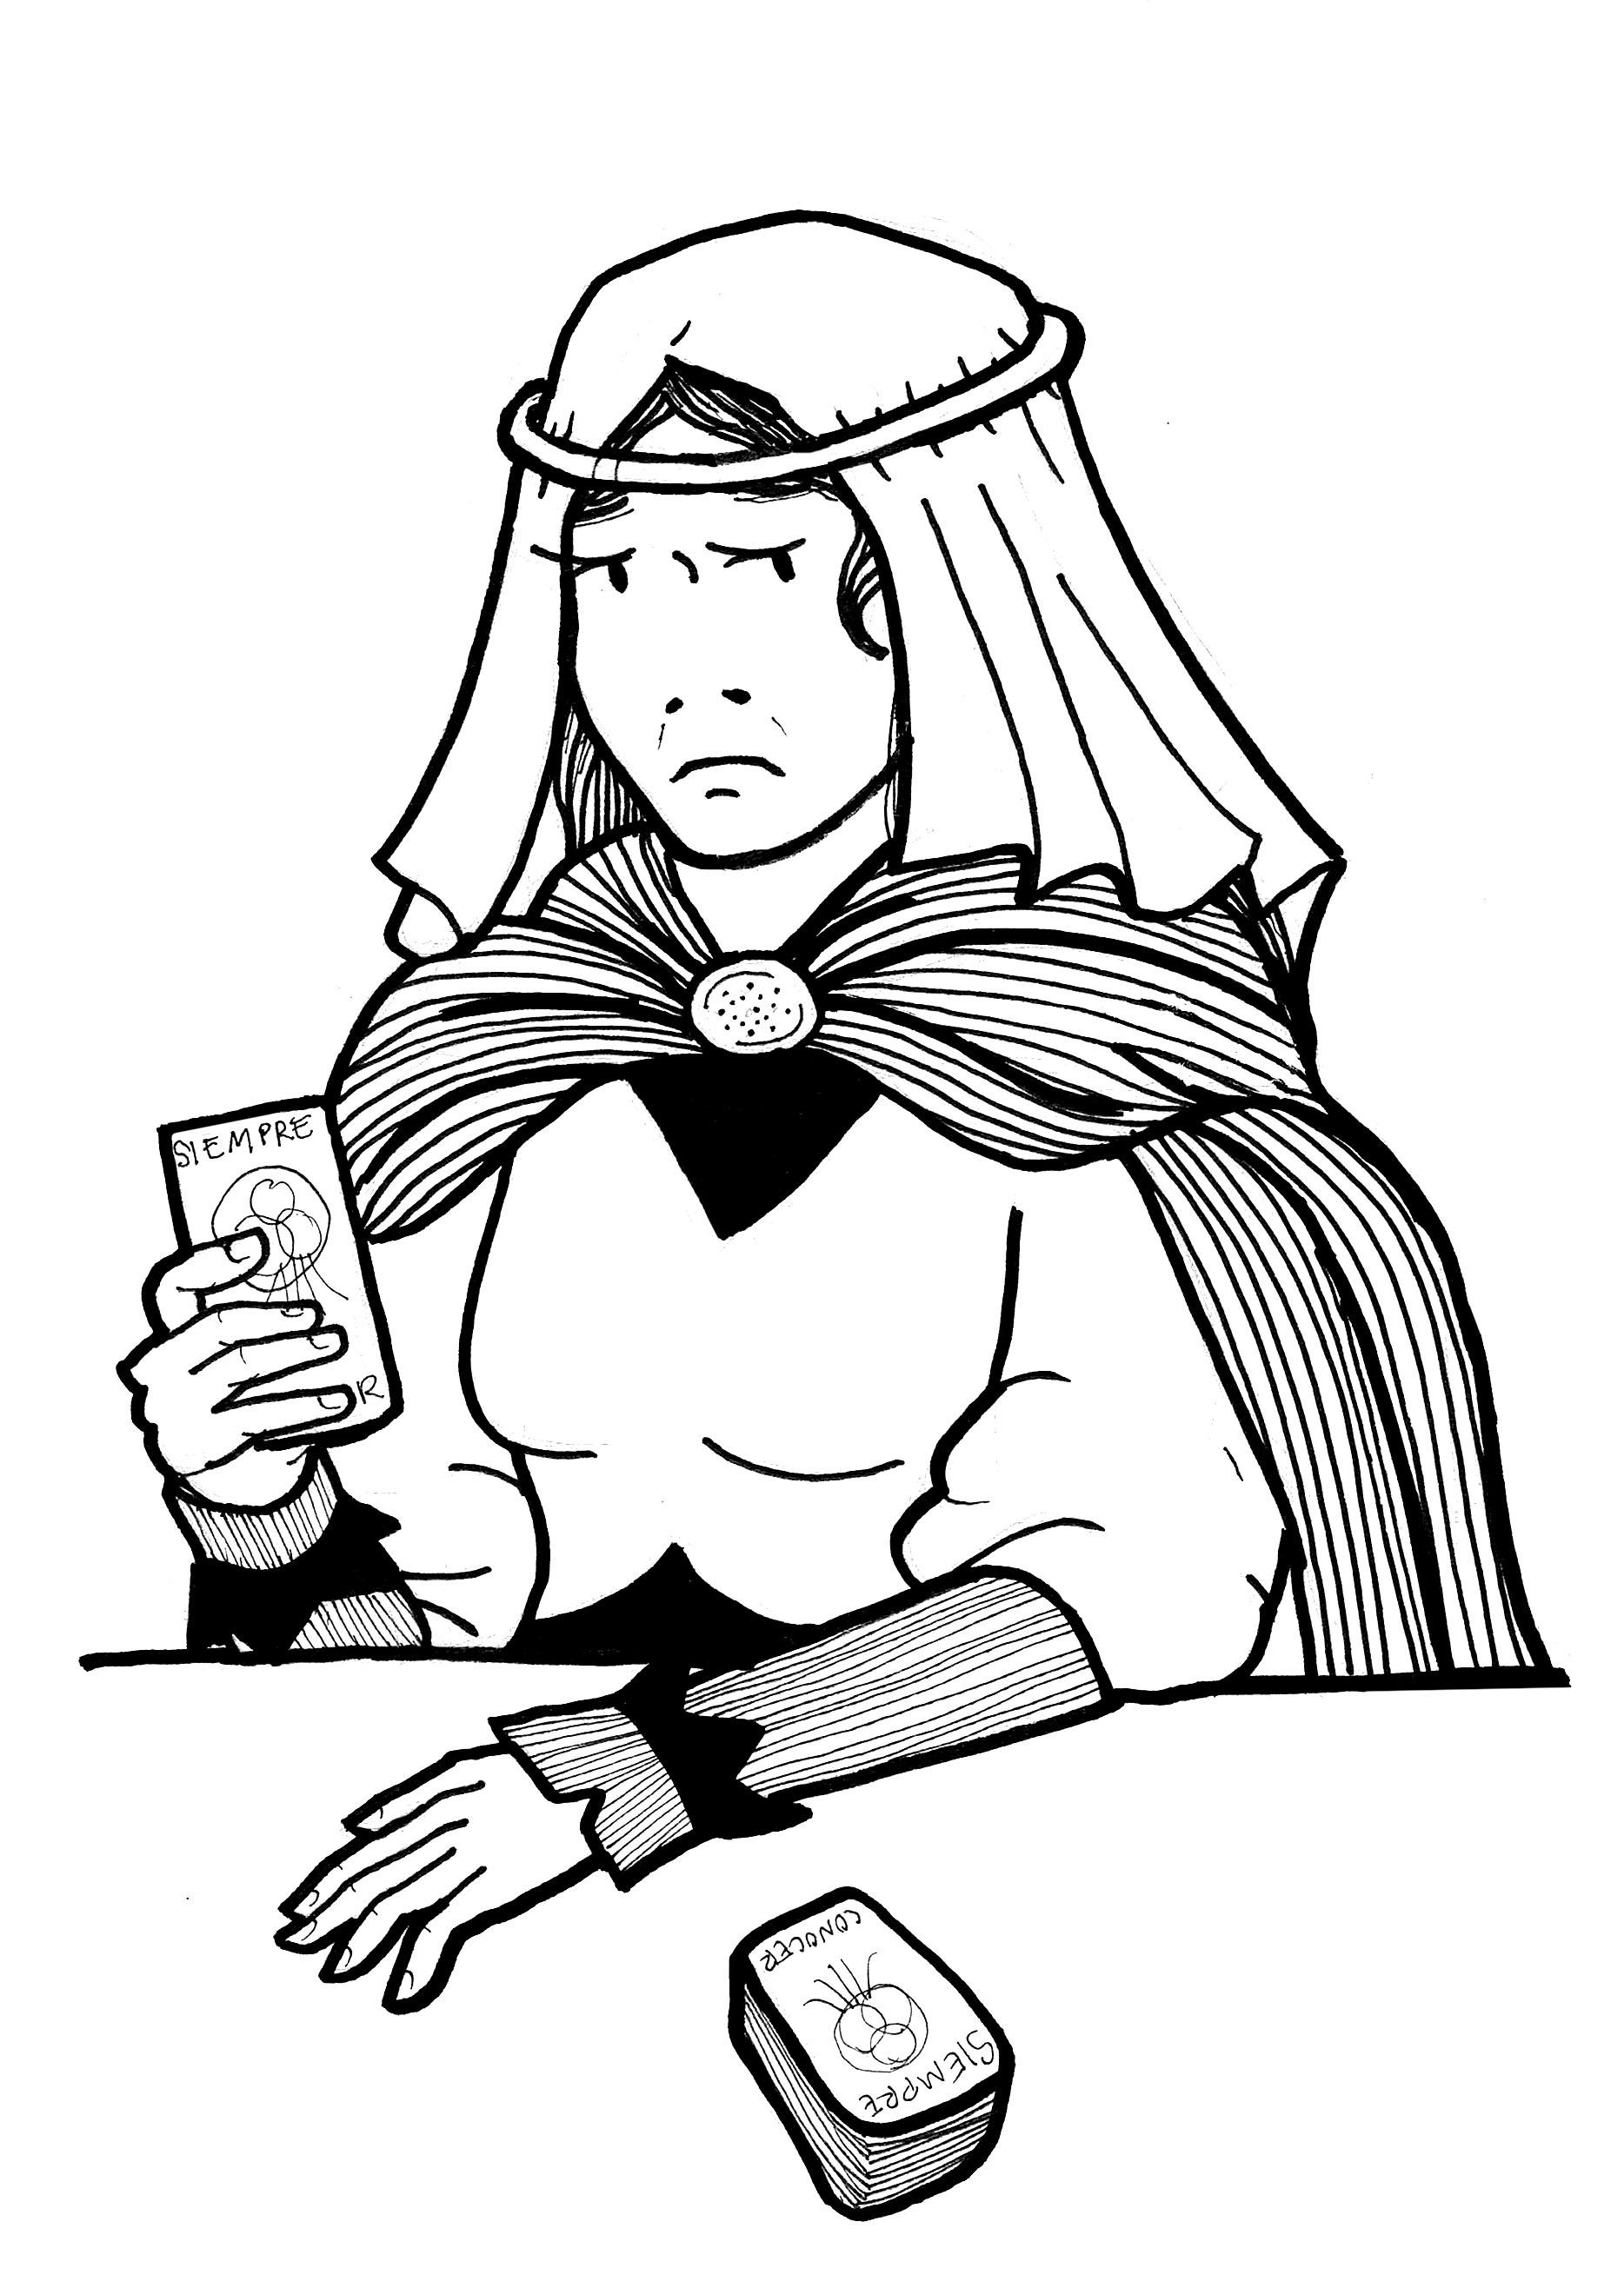 queencards.jpg